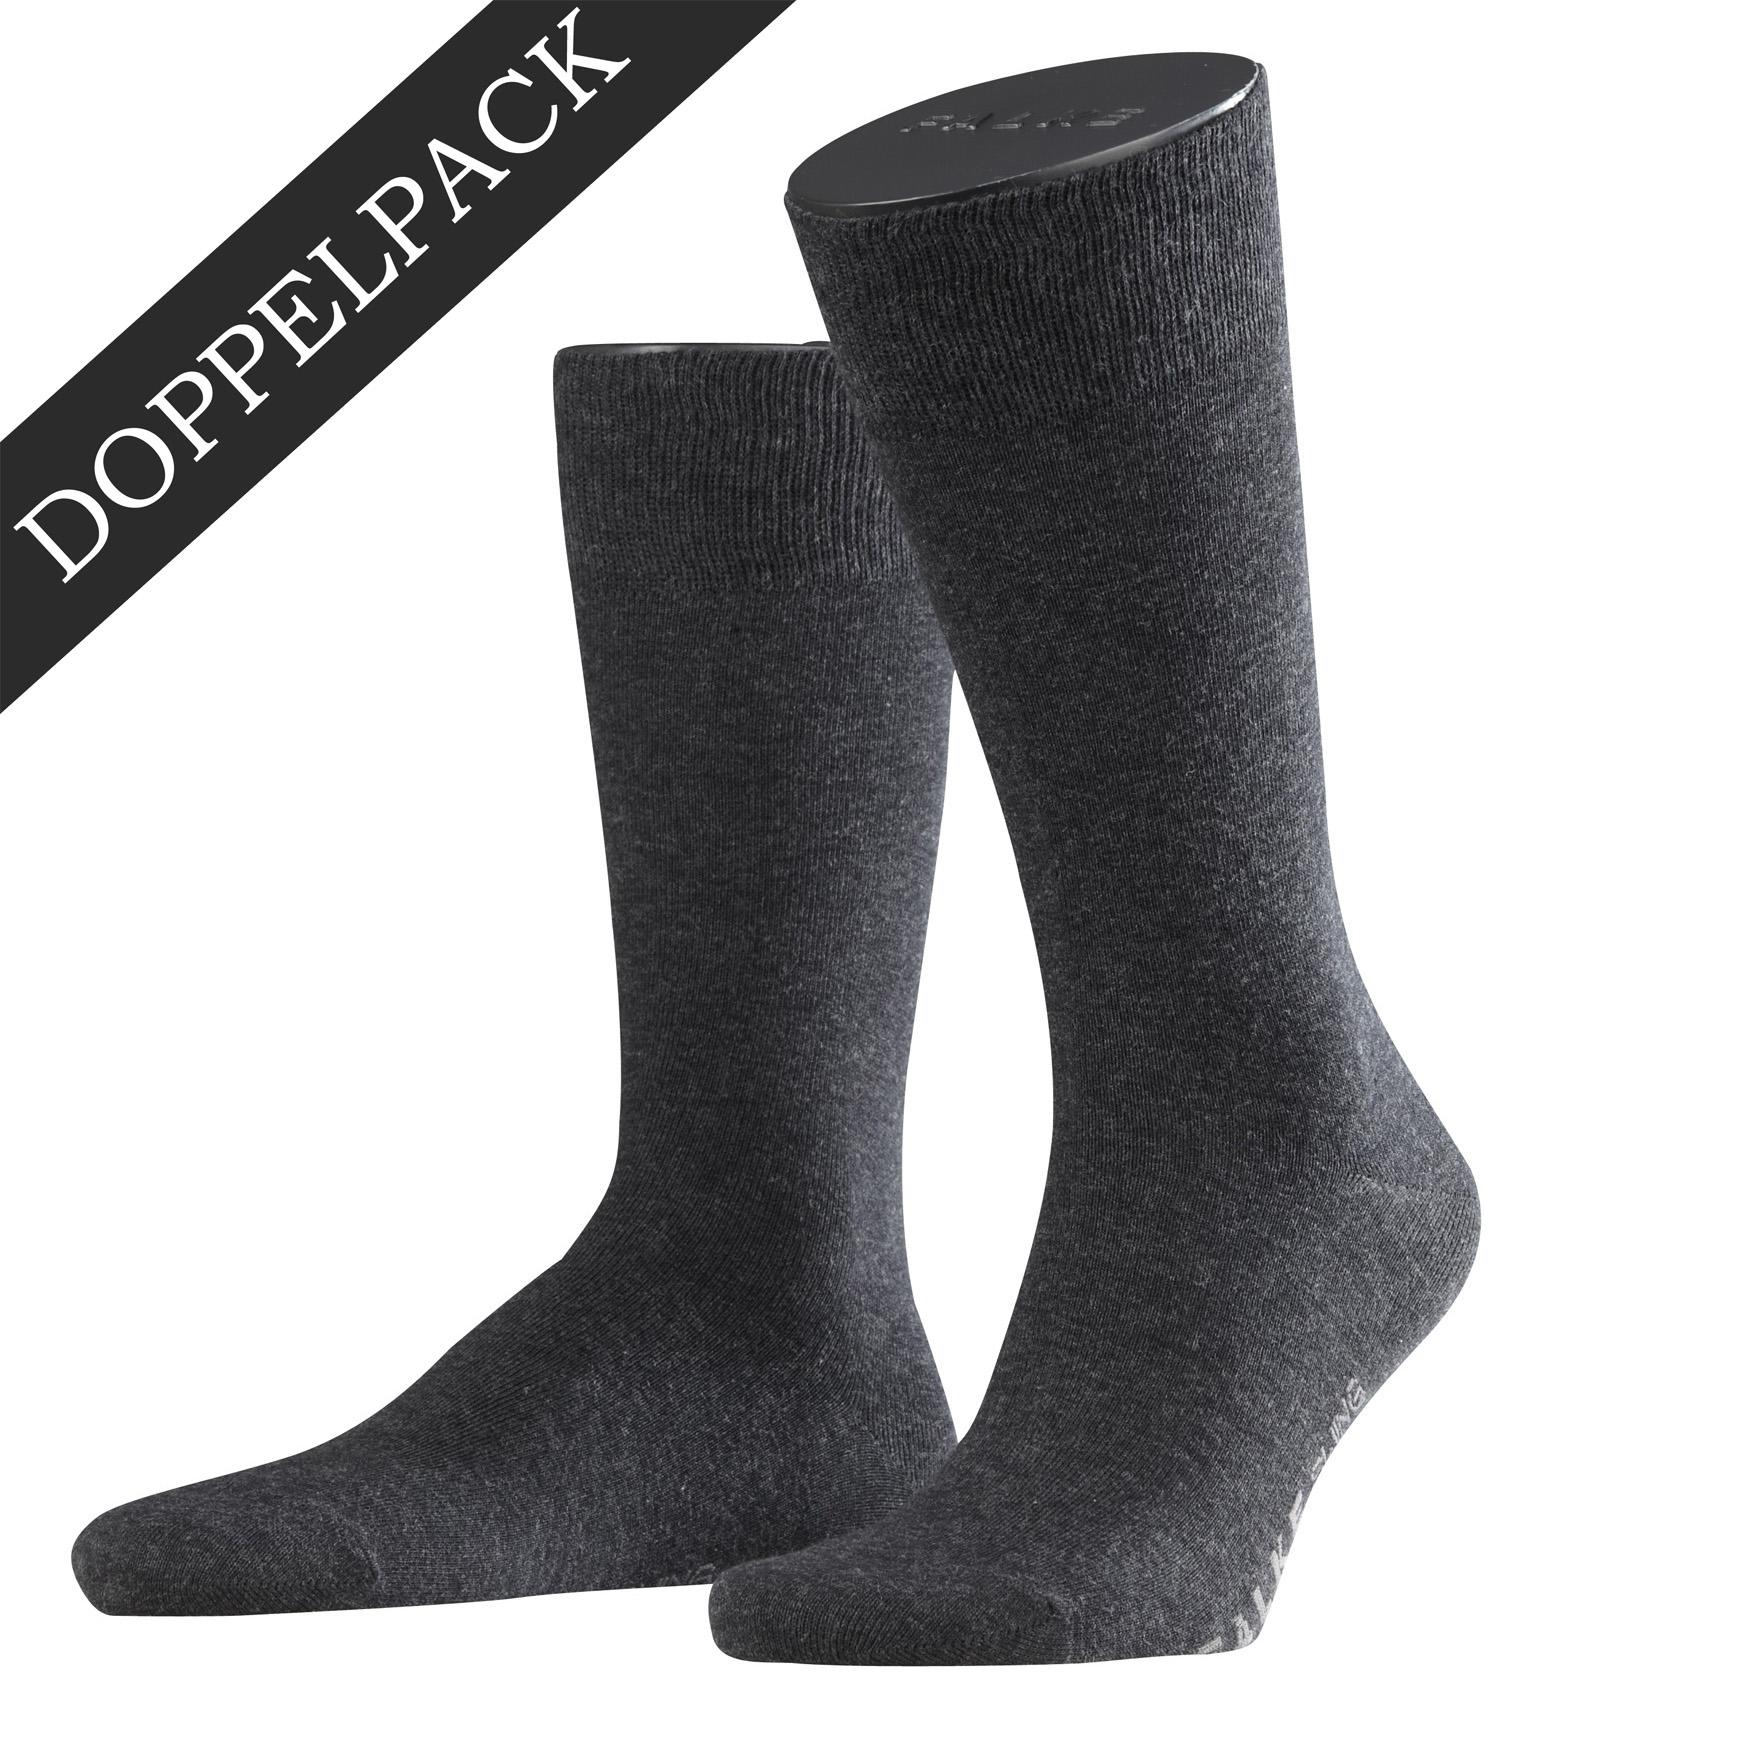 Falke Doppelpack Socke Swing anthrazit 14633 - 3080 Basic Baumwolle